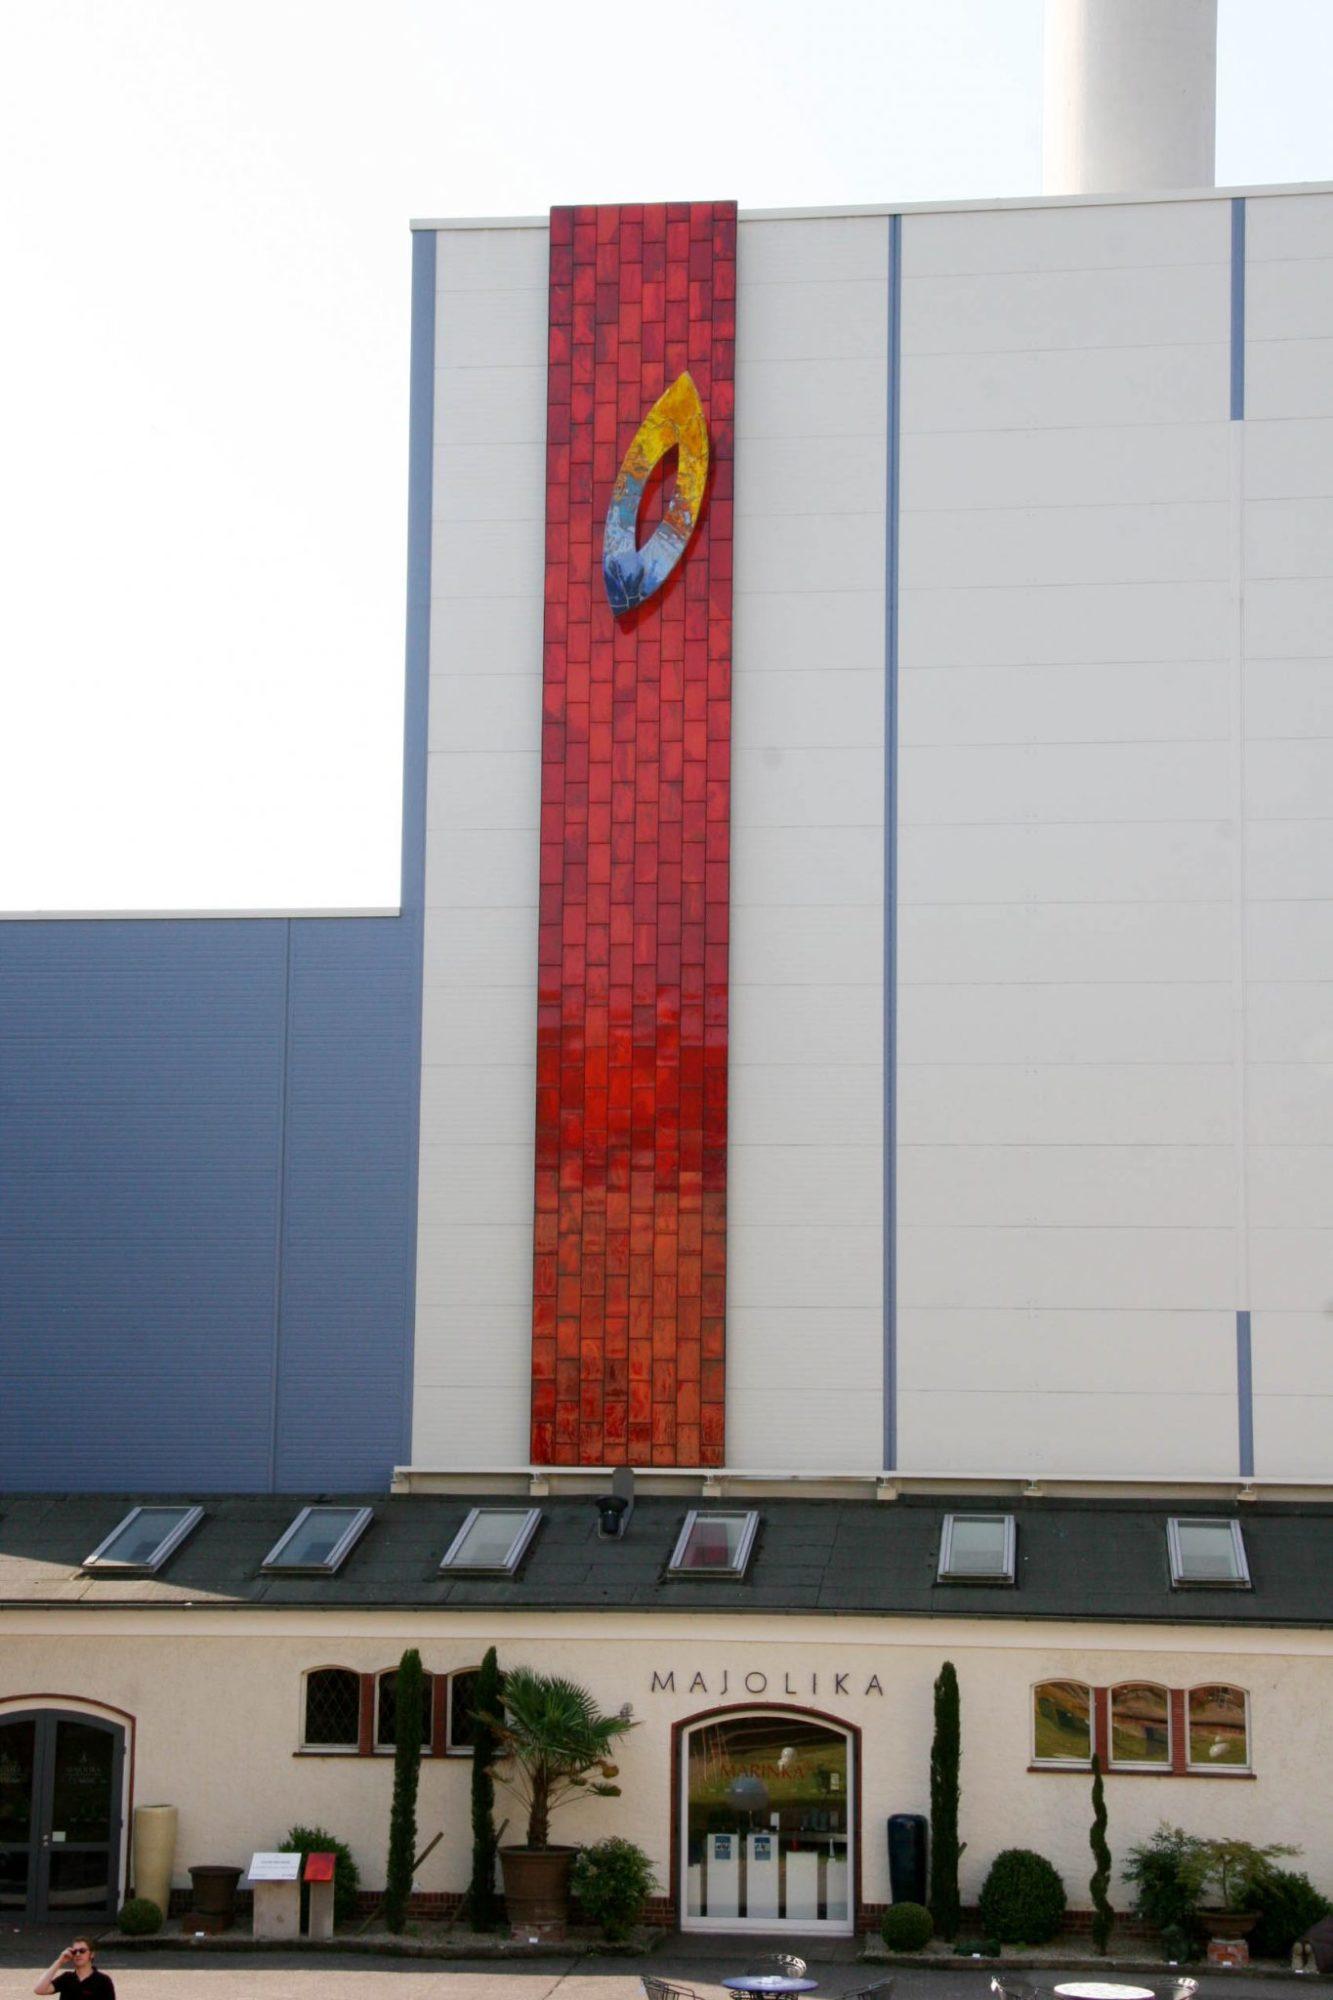 Stadtwerke, Karlsruhe